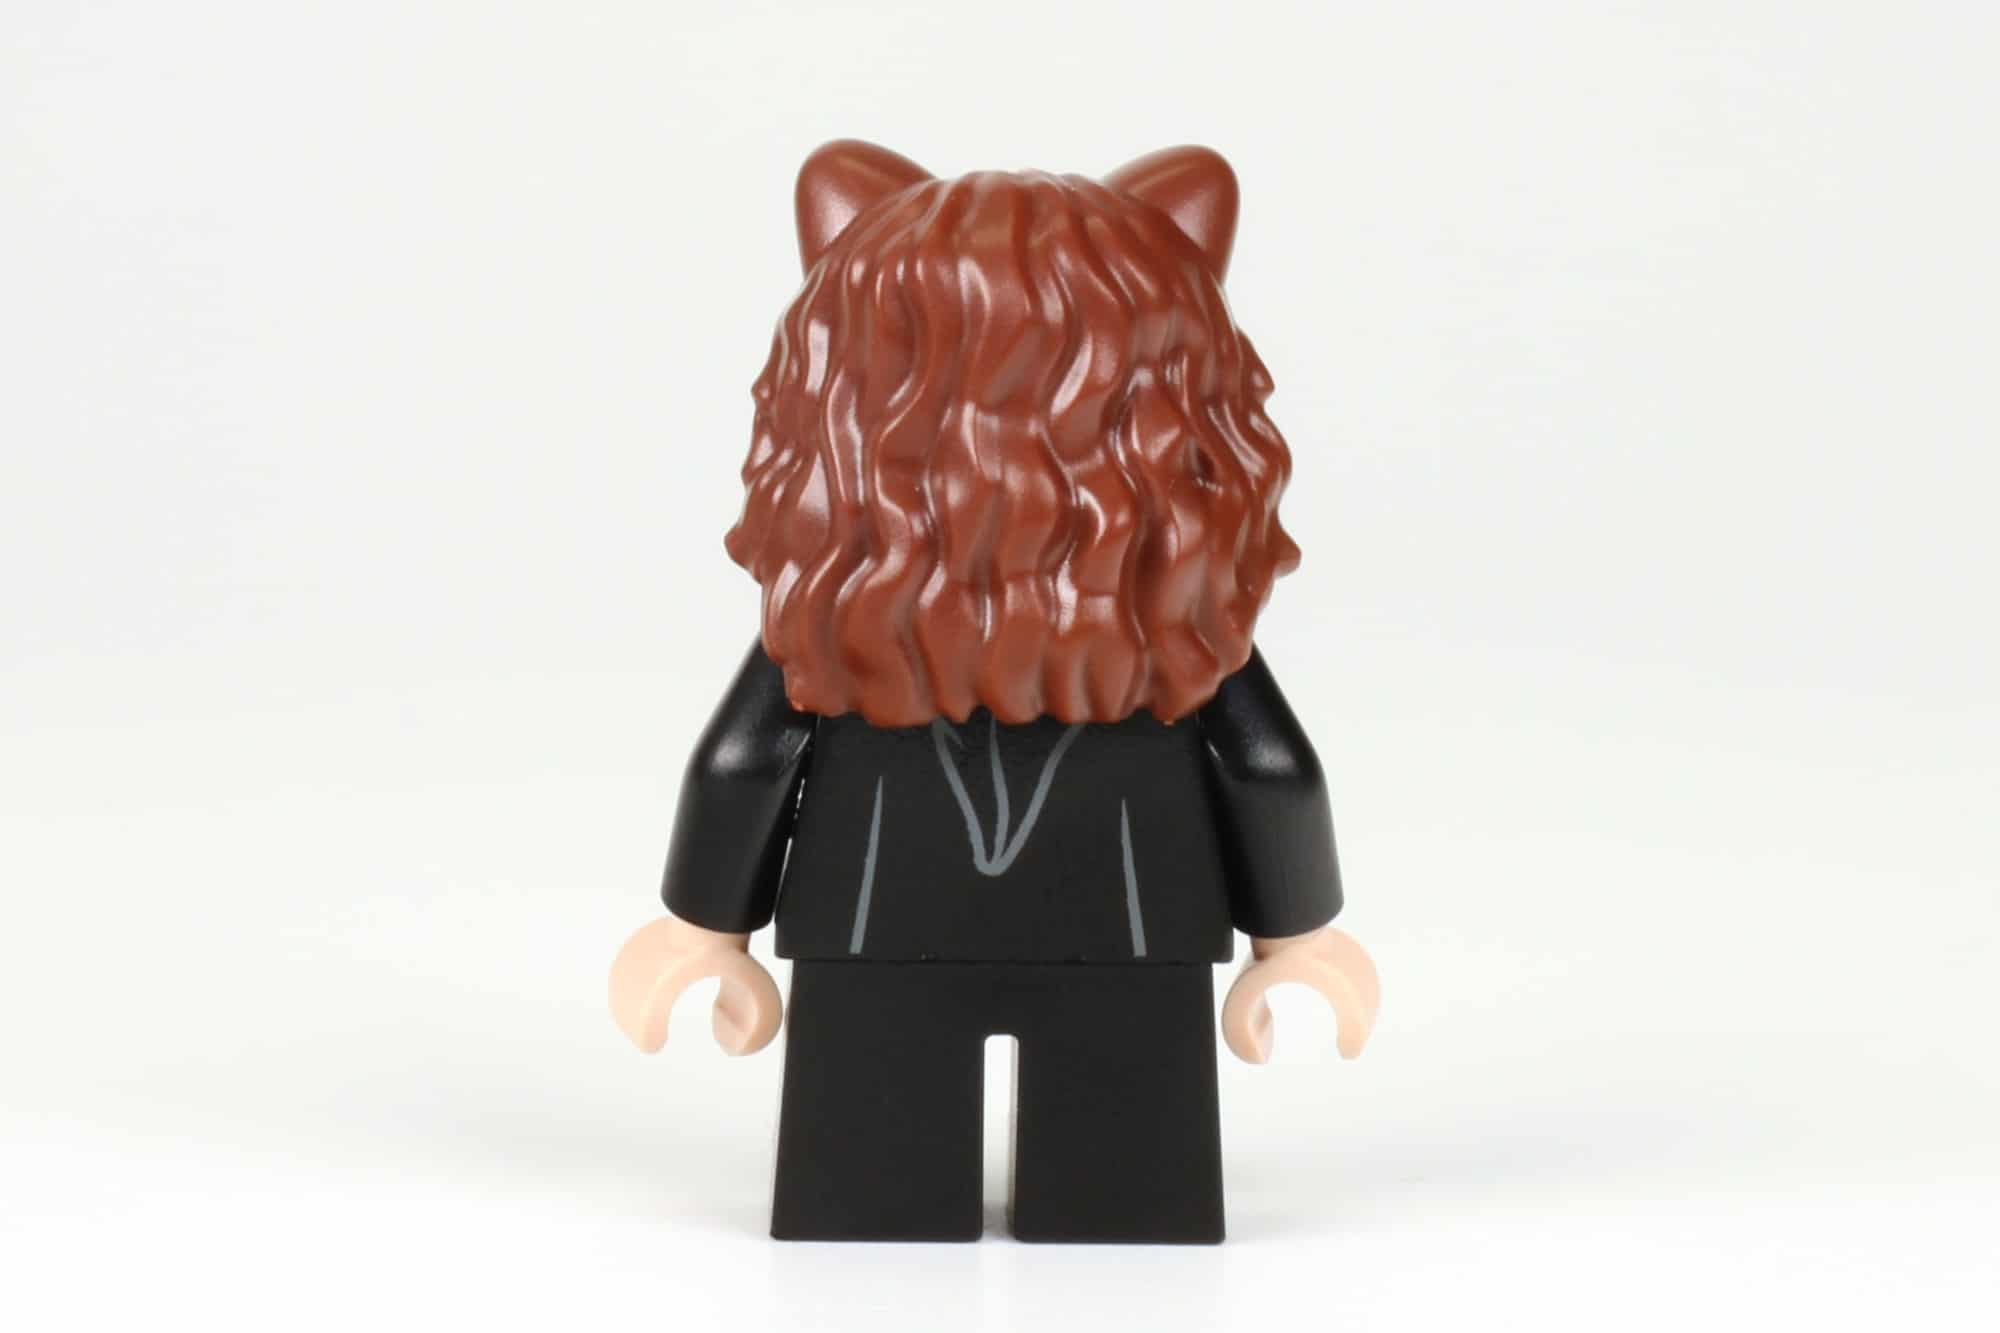 LEGO Harry Potter 76386 Hogwarts Misslungener Vielsafttrank Minifiguren 1 4